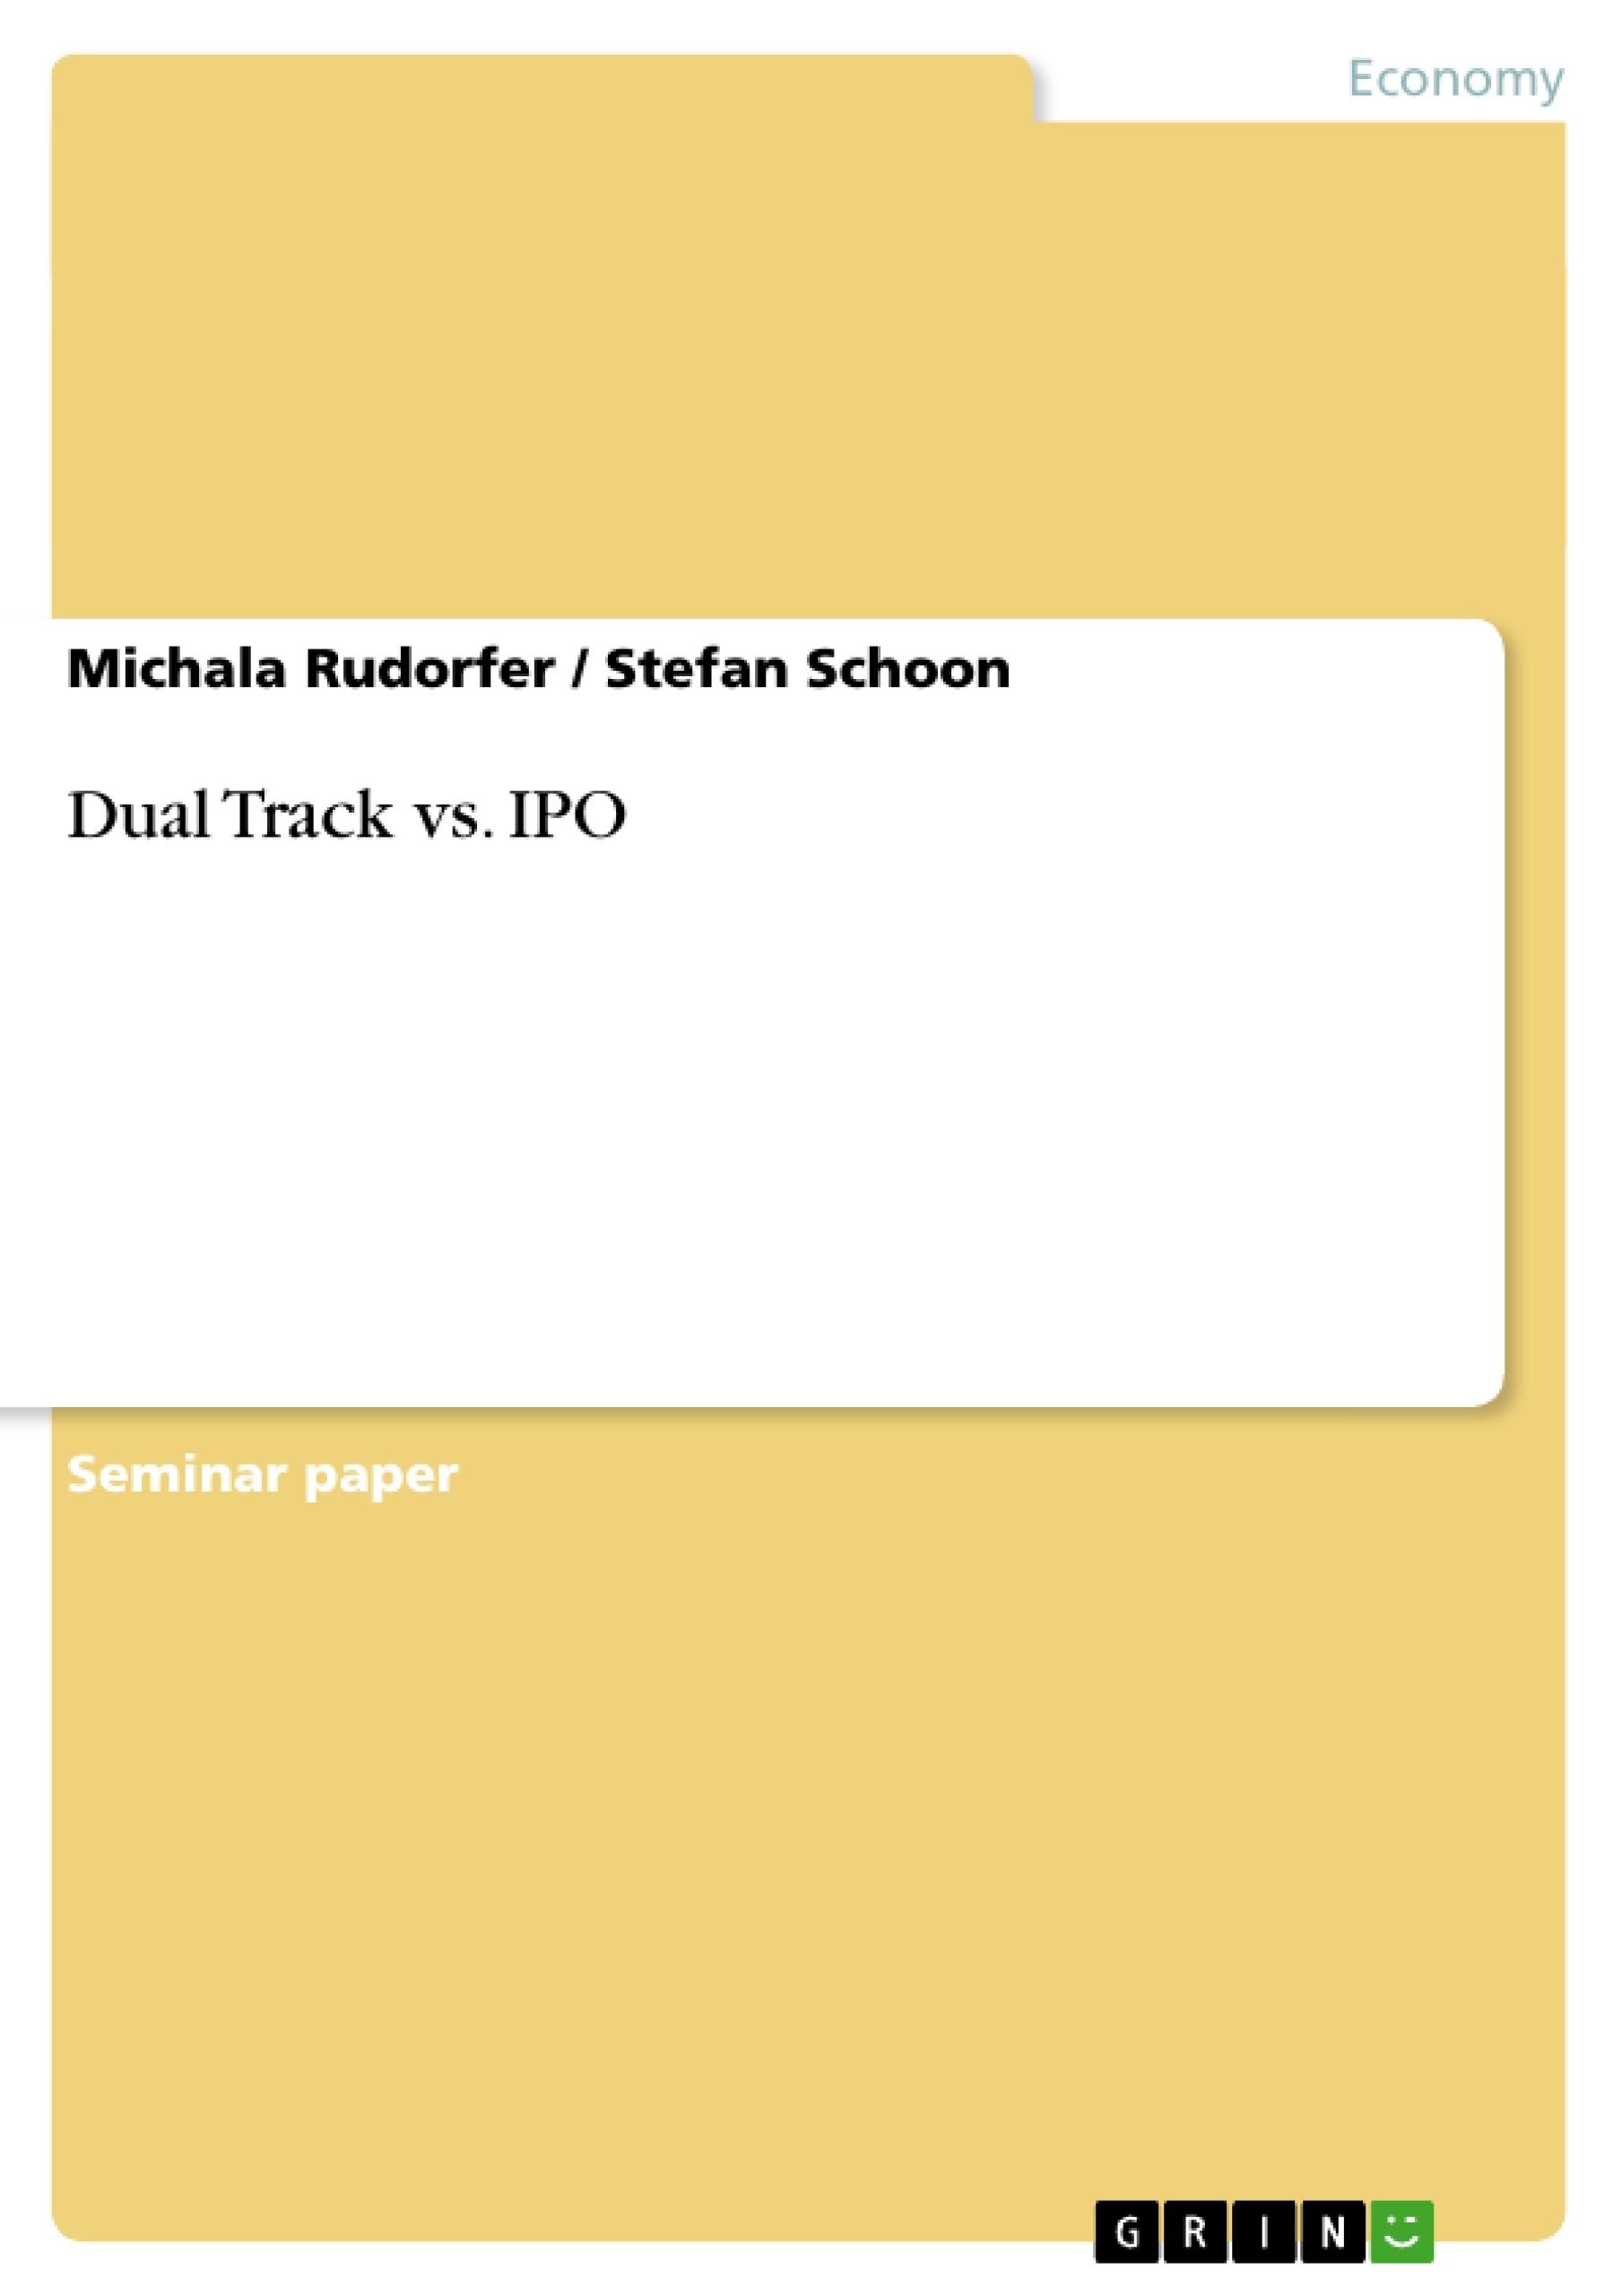 Title: Dual Track vs. IPO